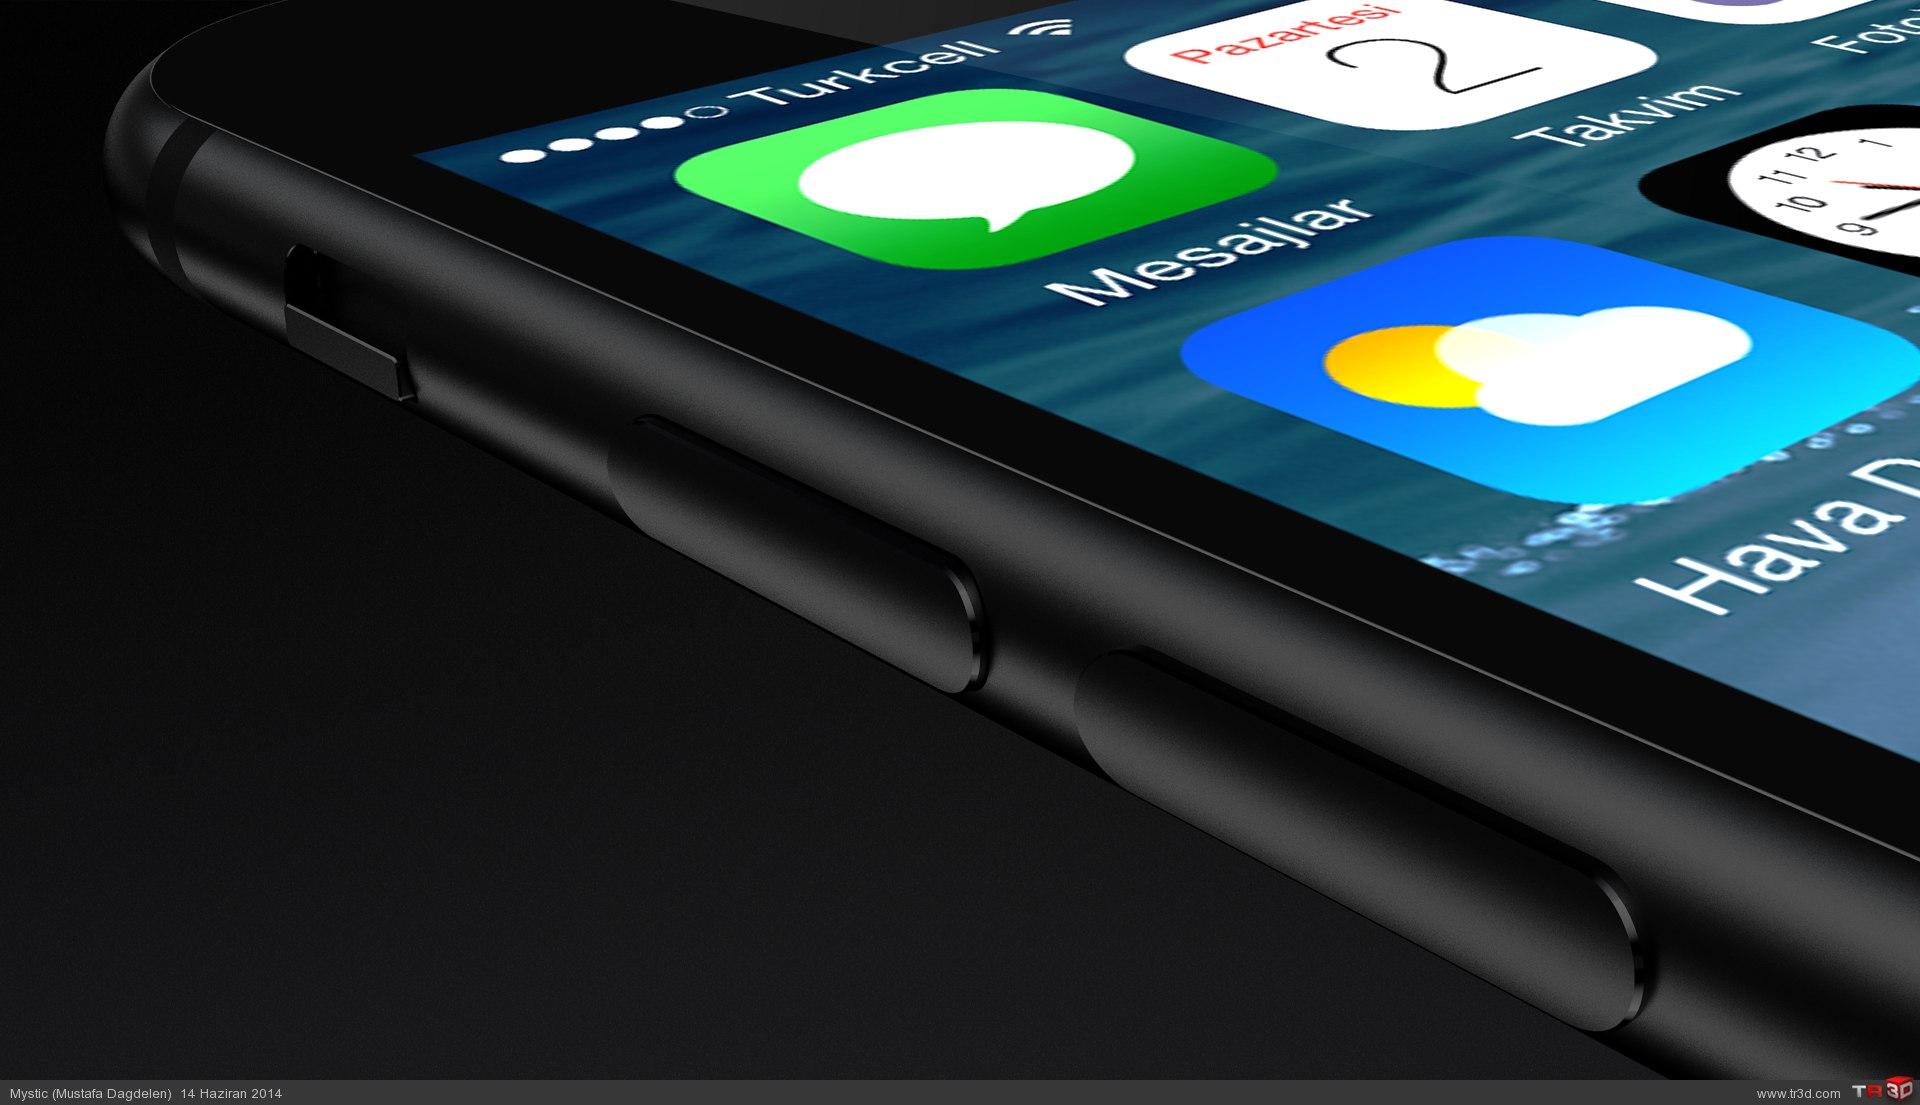 Apple iPhone 6 Finally 1